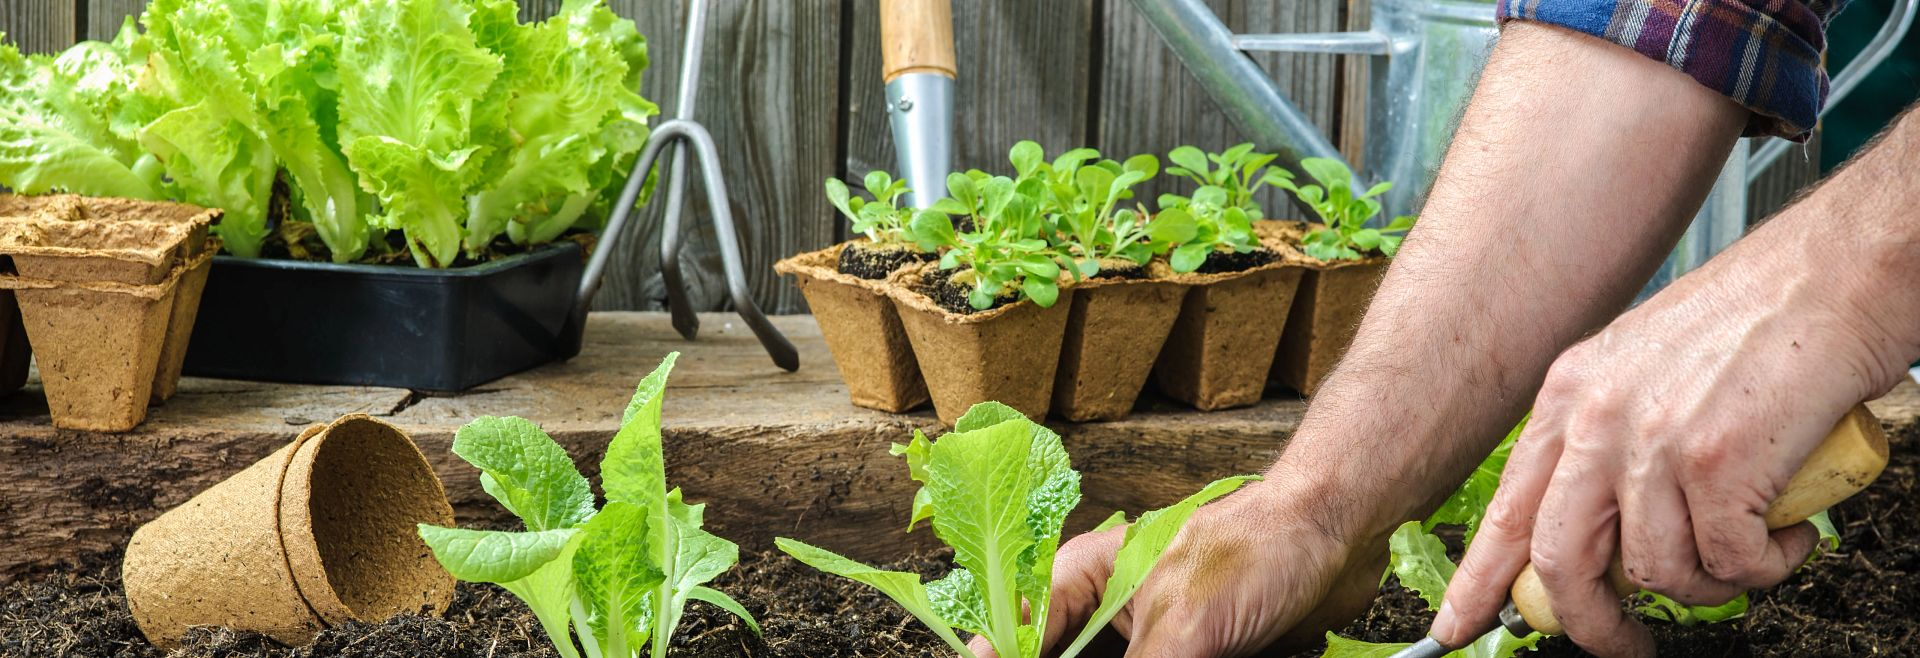 Man Hands Planting Vegetable Garden Getty Images